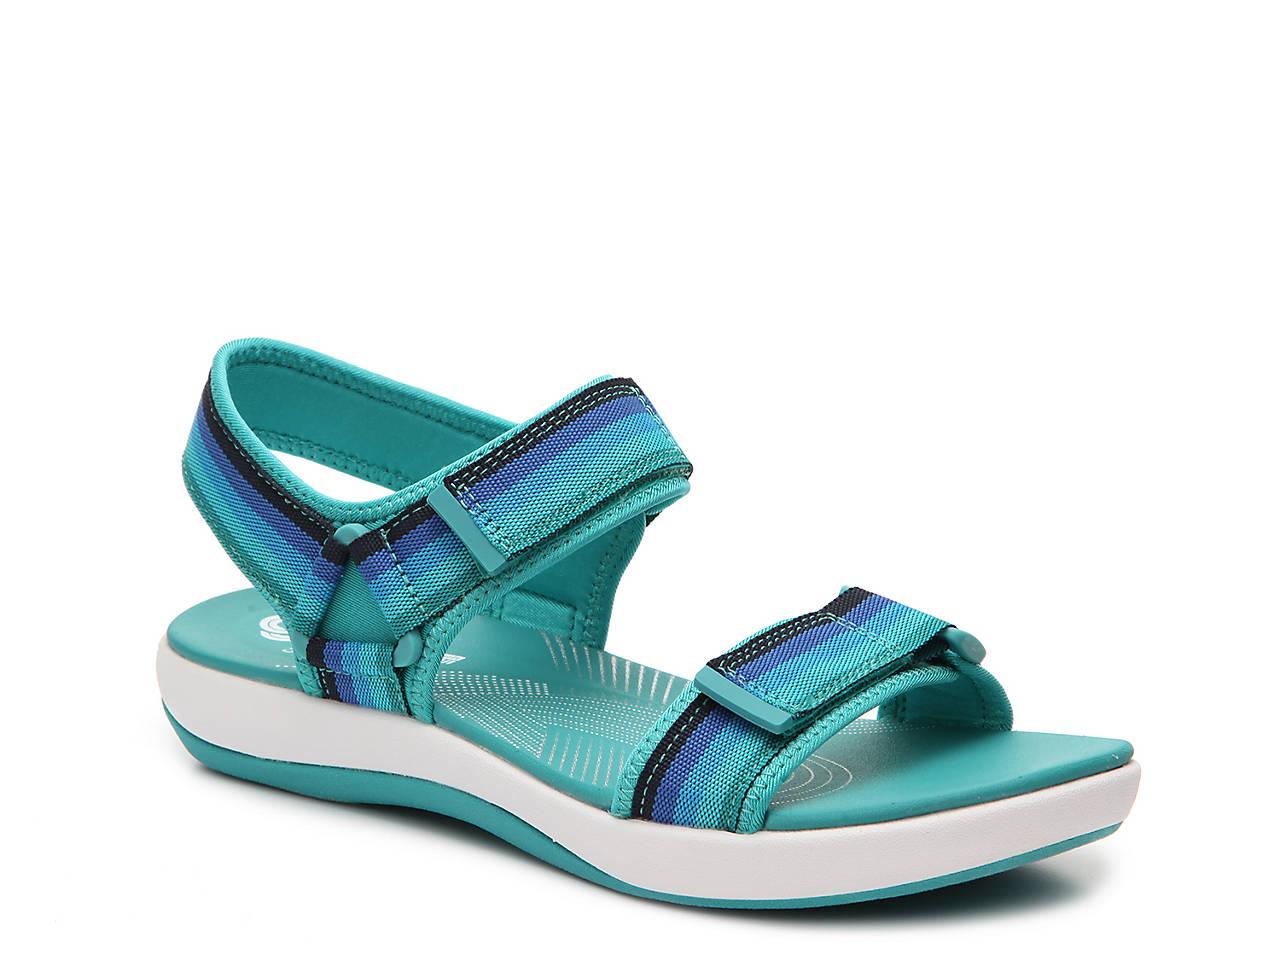 2da983da2e6d Cloudsteppers by Clarks Brizo Ravena Sport Sandal Women s Shoes